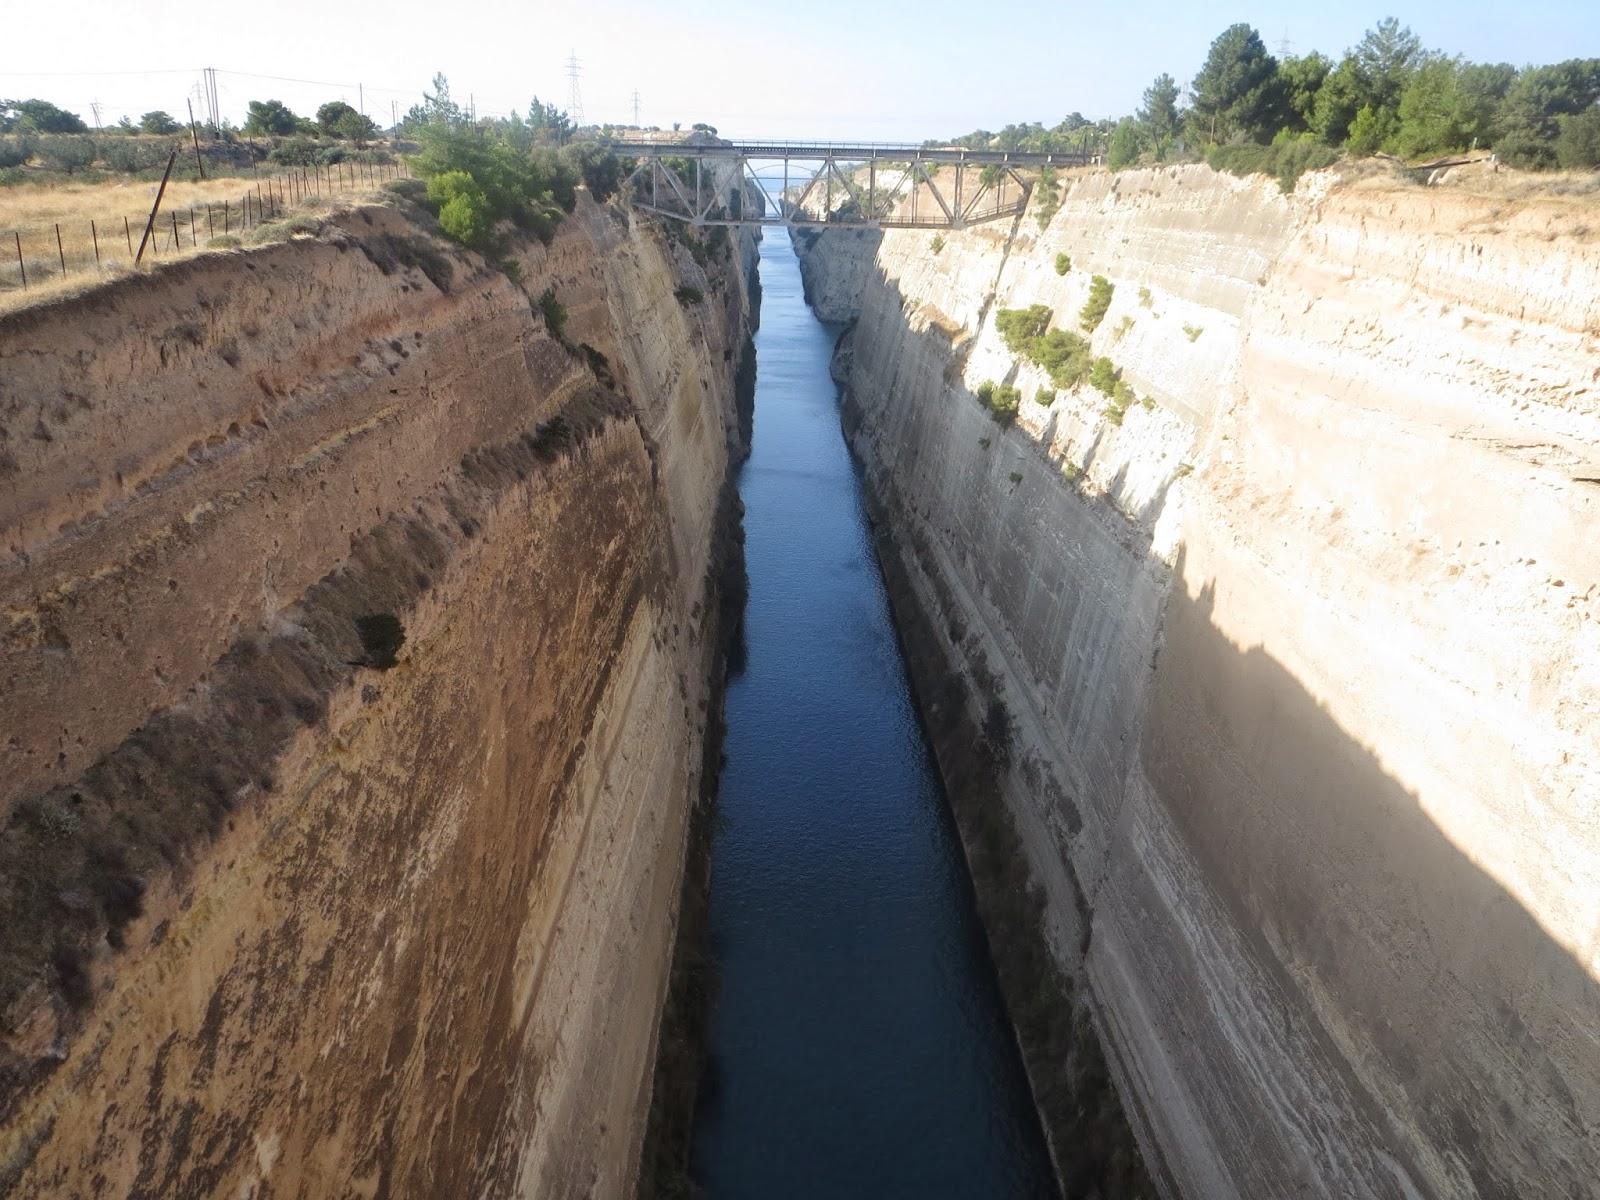 londinoupolis: The Corinth Canal